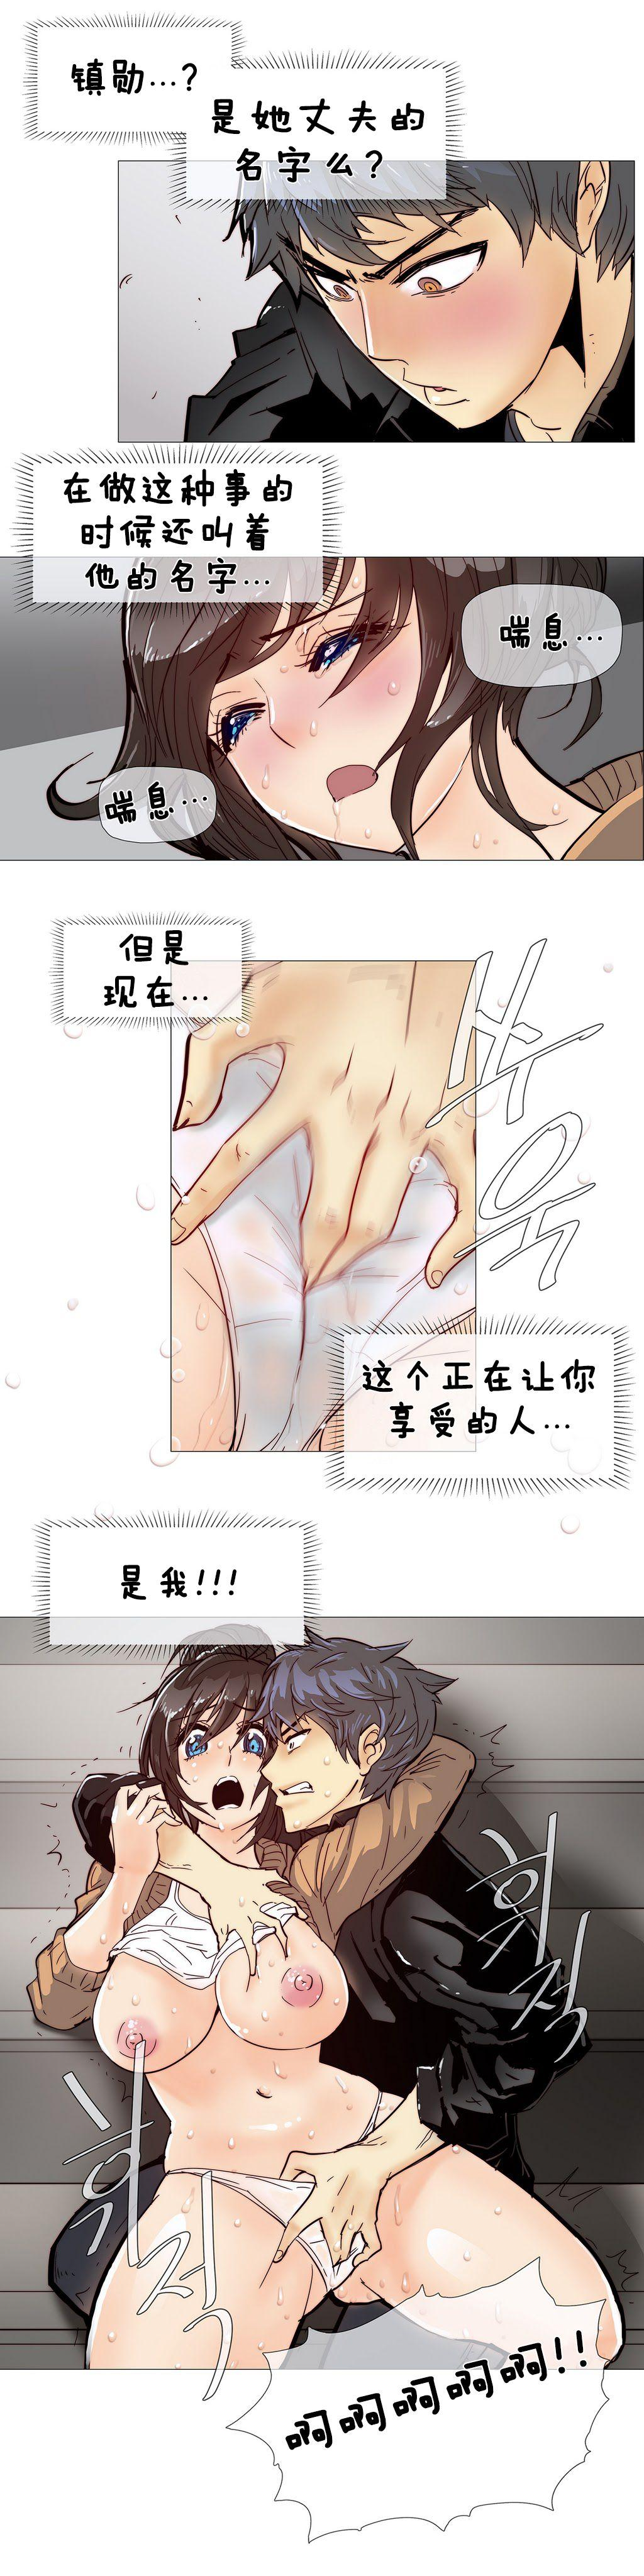 HouseHold Affairs 【卞赤鲤个人汉化】1~33话(持续更新中) 131